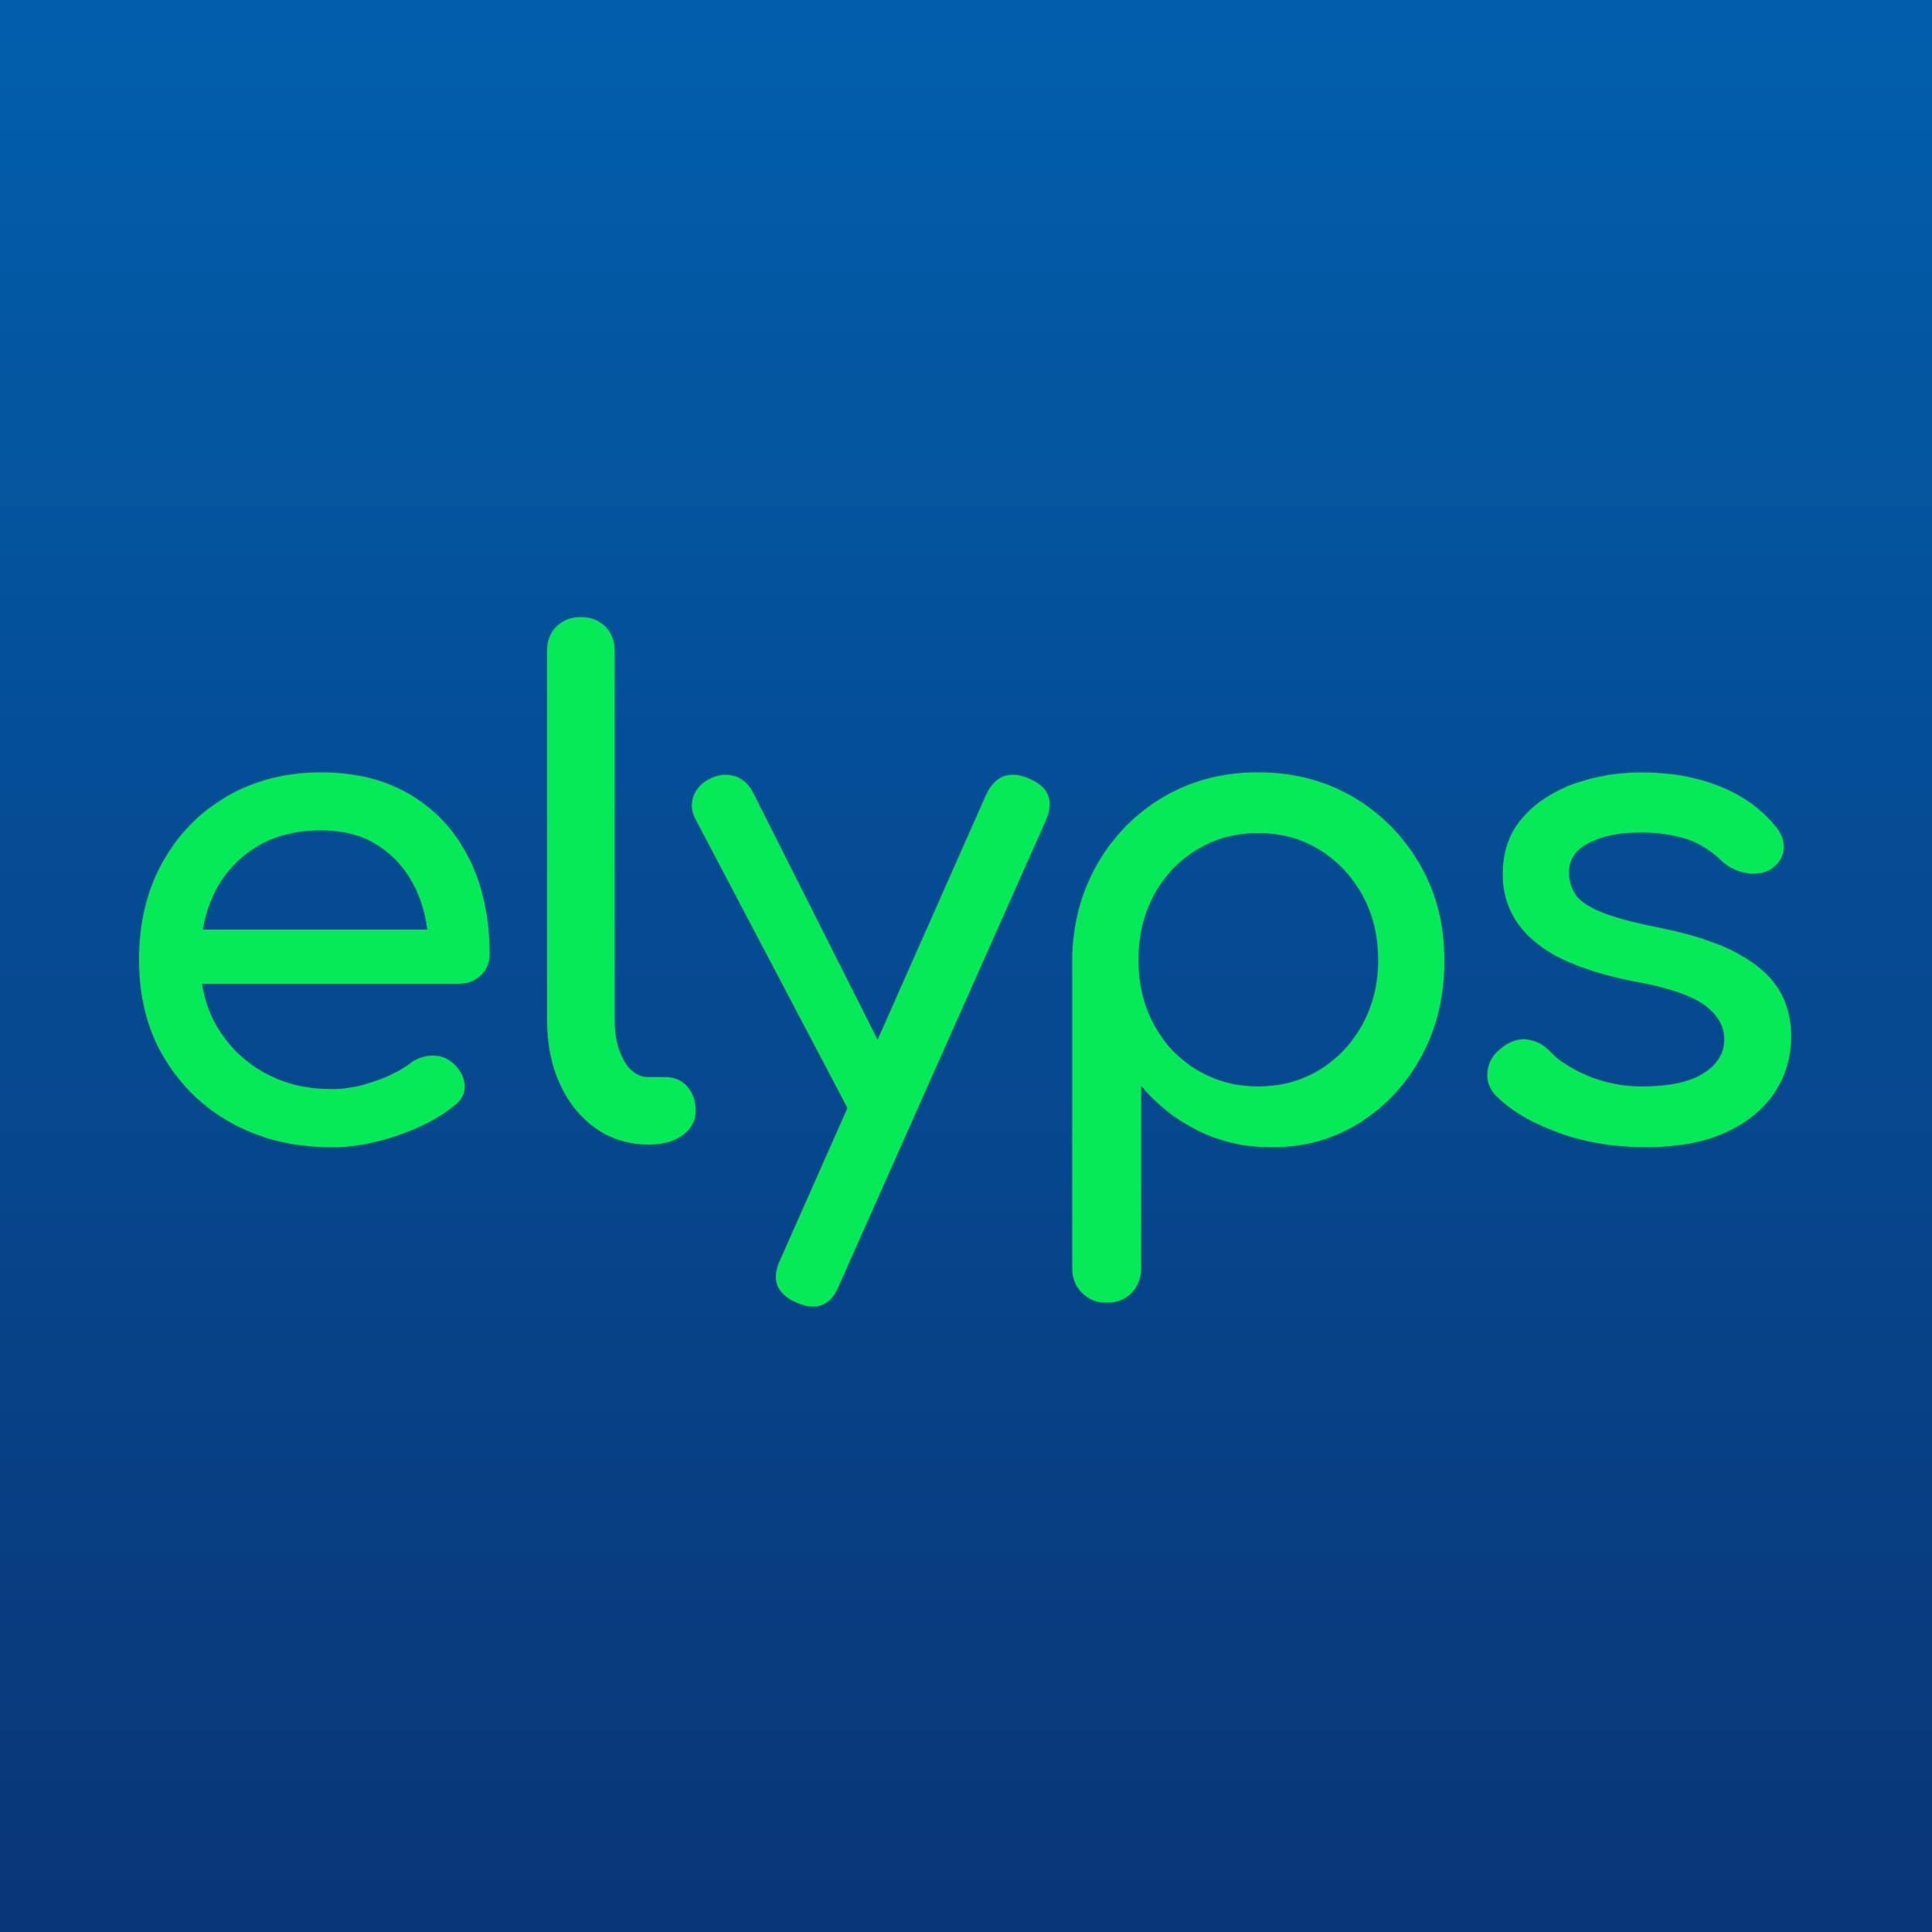 Elyps - Logo